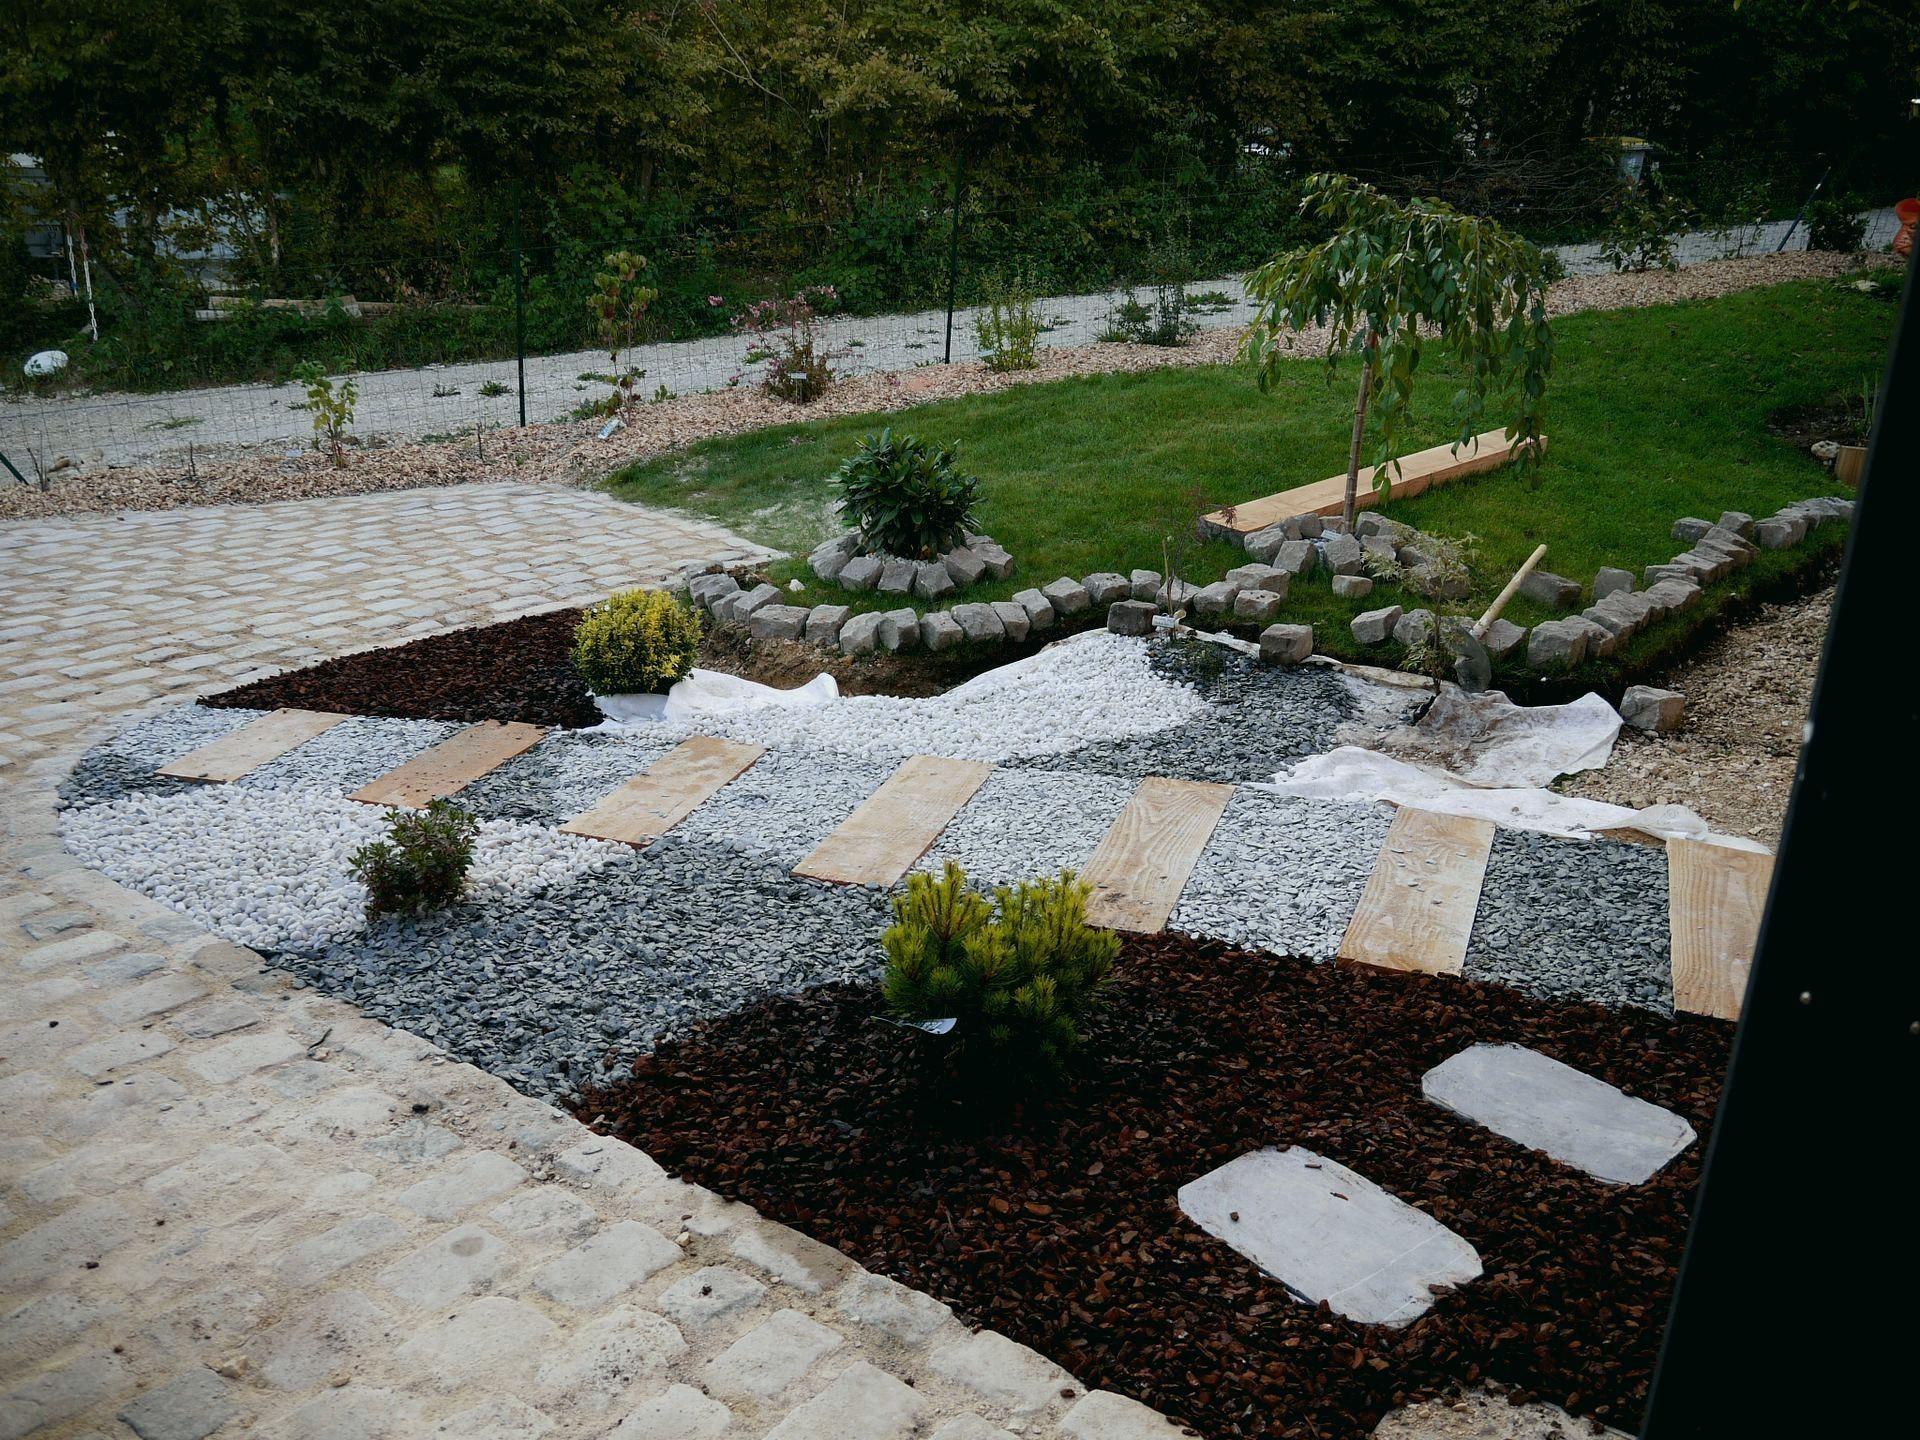 All E De Jardin Pas Cher Design De Maison Bordure Alle ... concernant Bordure De Jardin Pas Cher